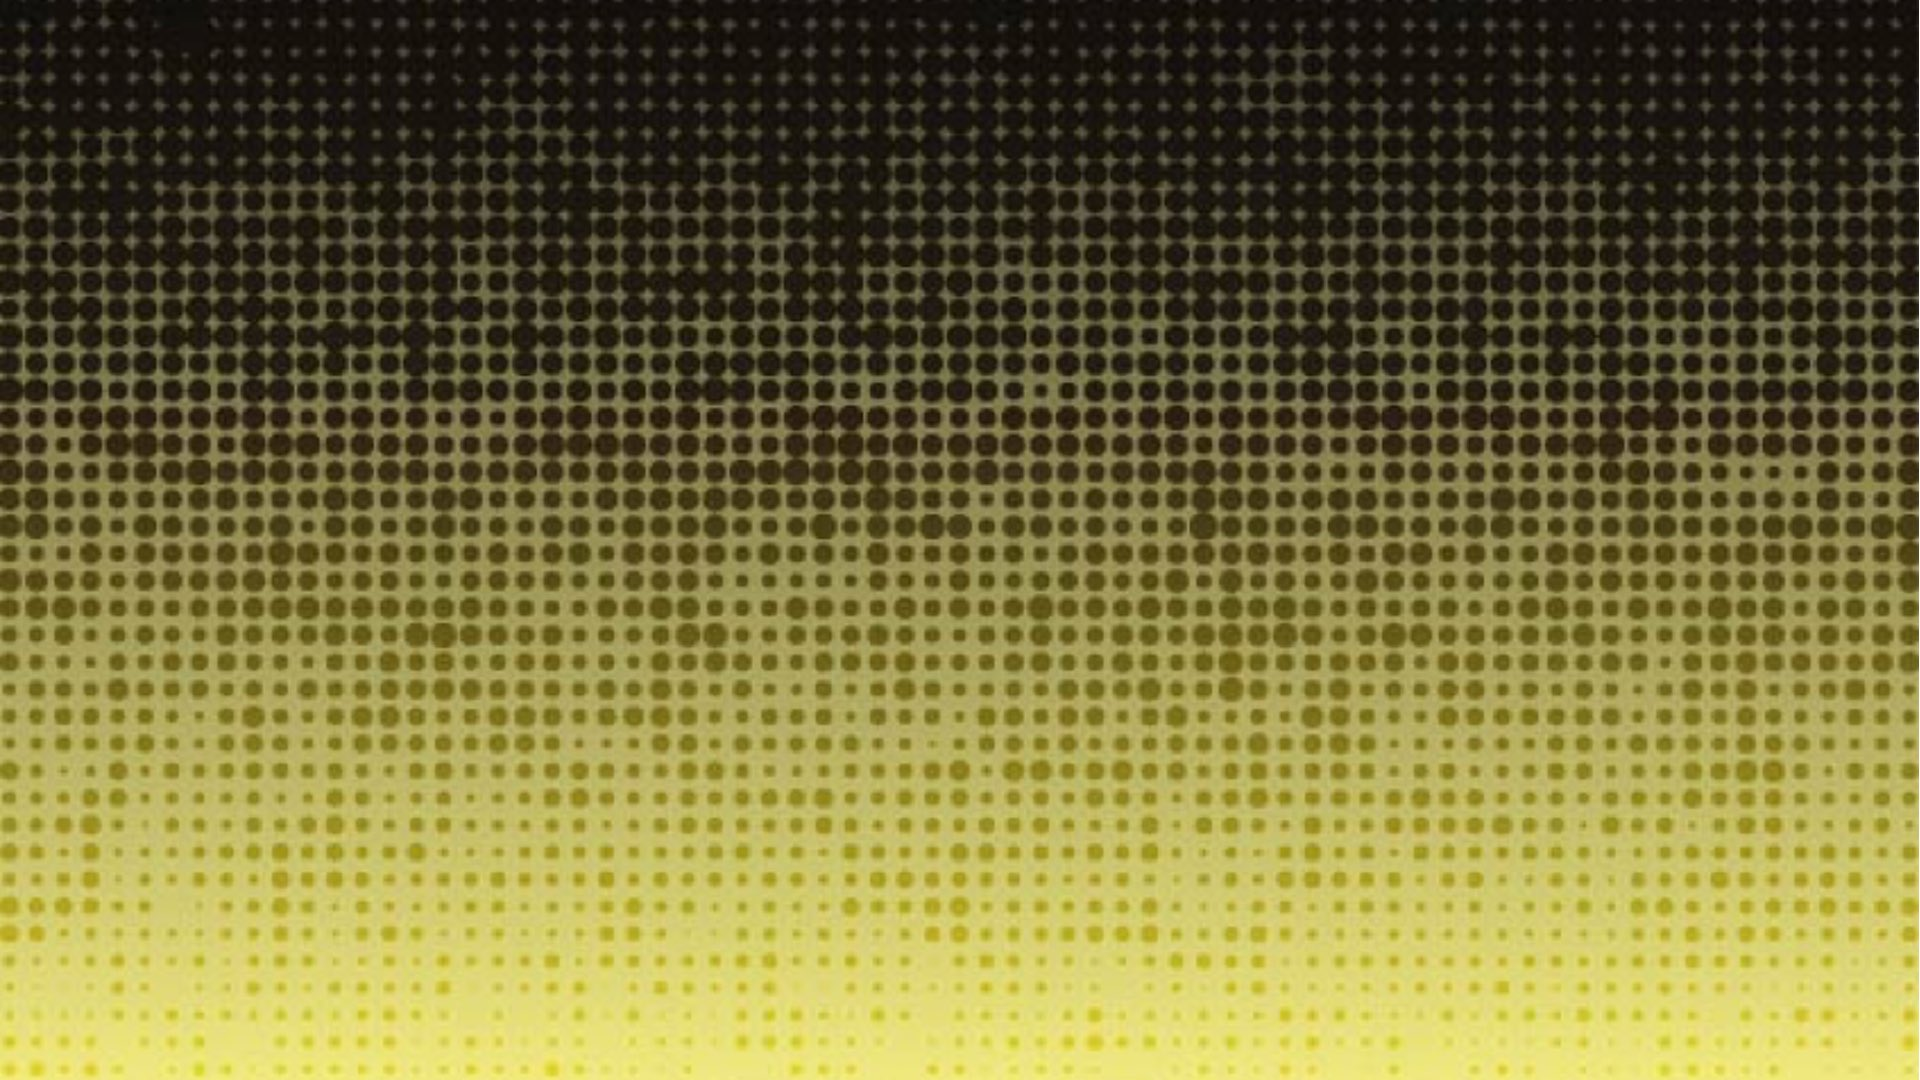 The Superlative Light_Video Thumbnail.jpg